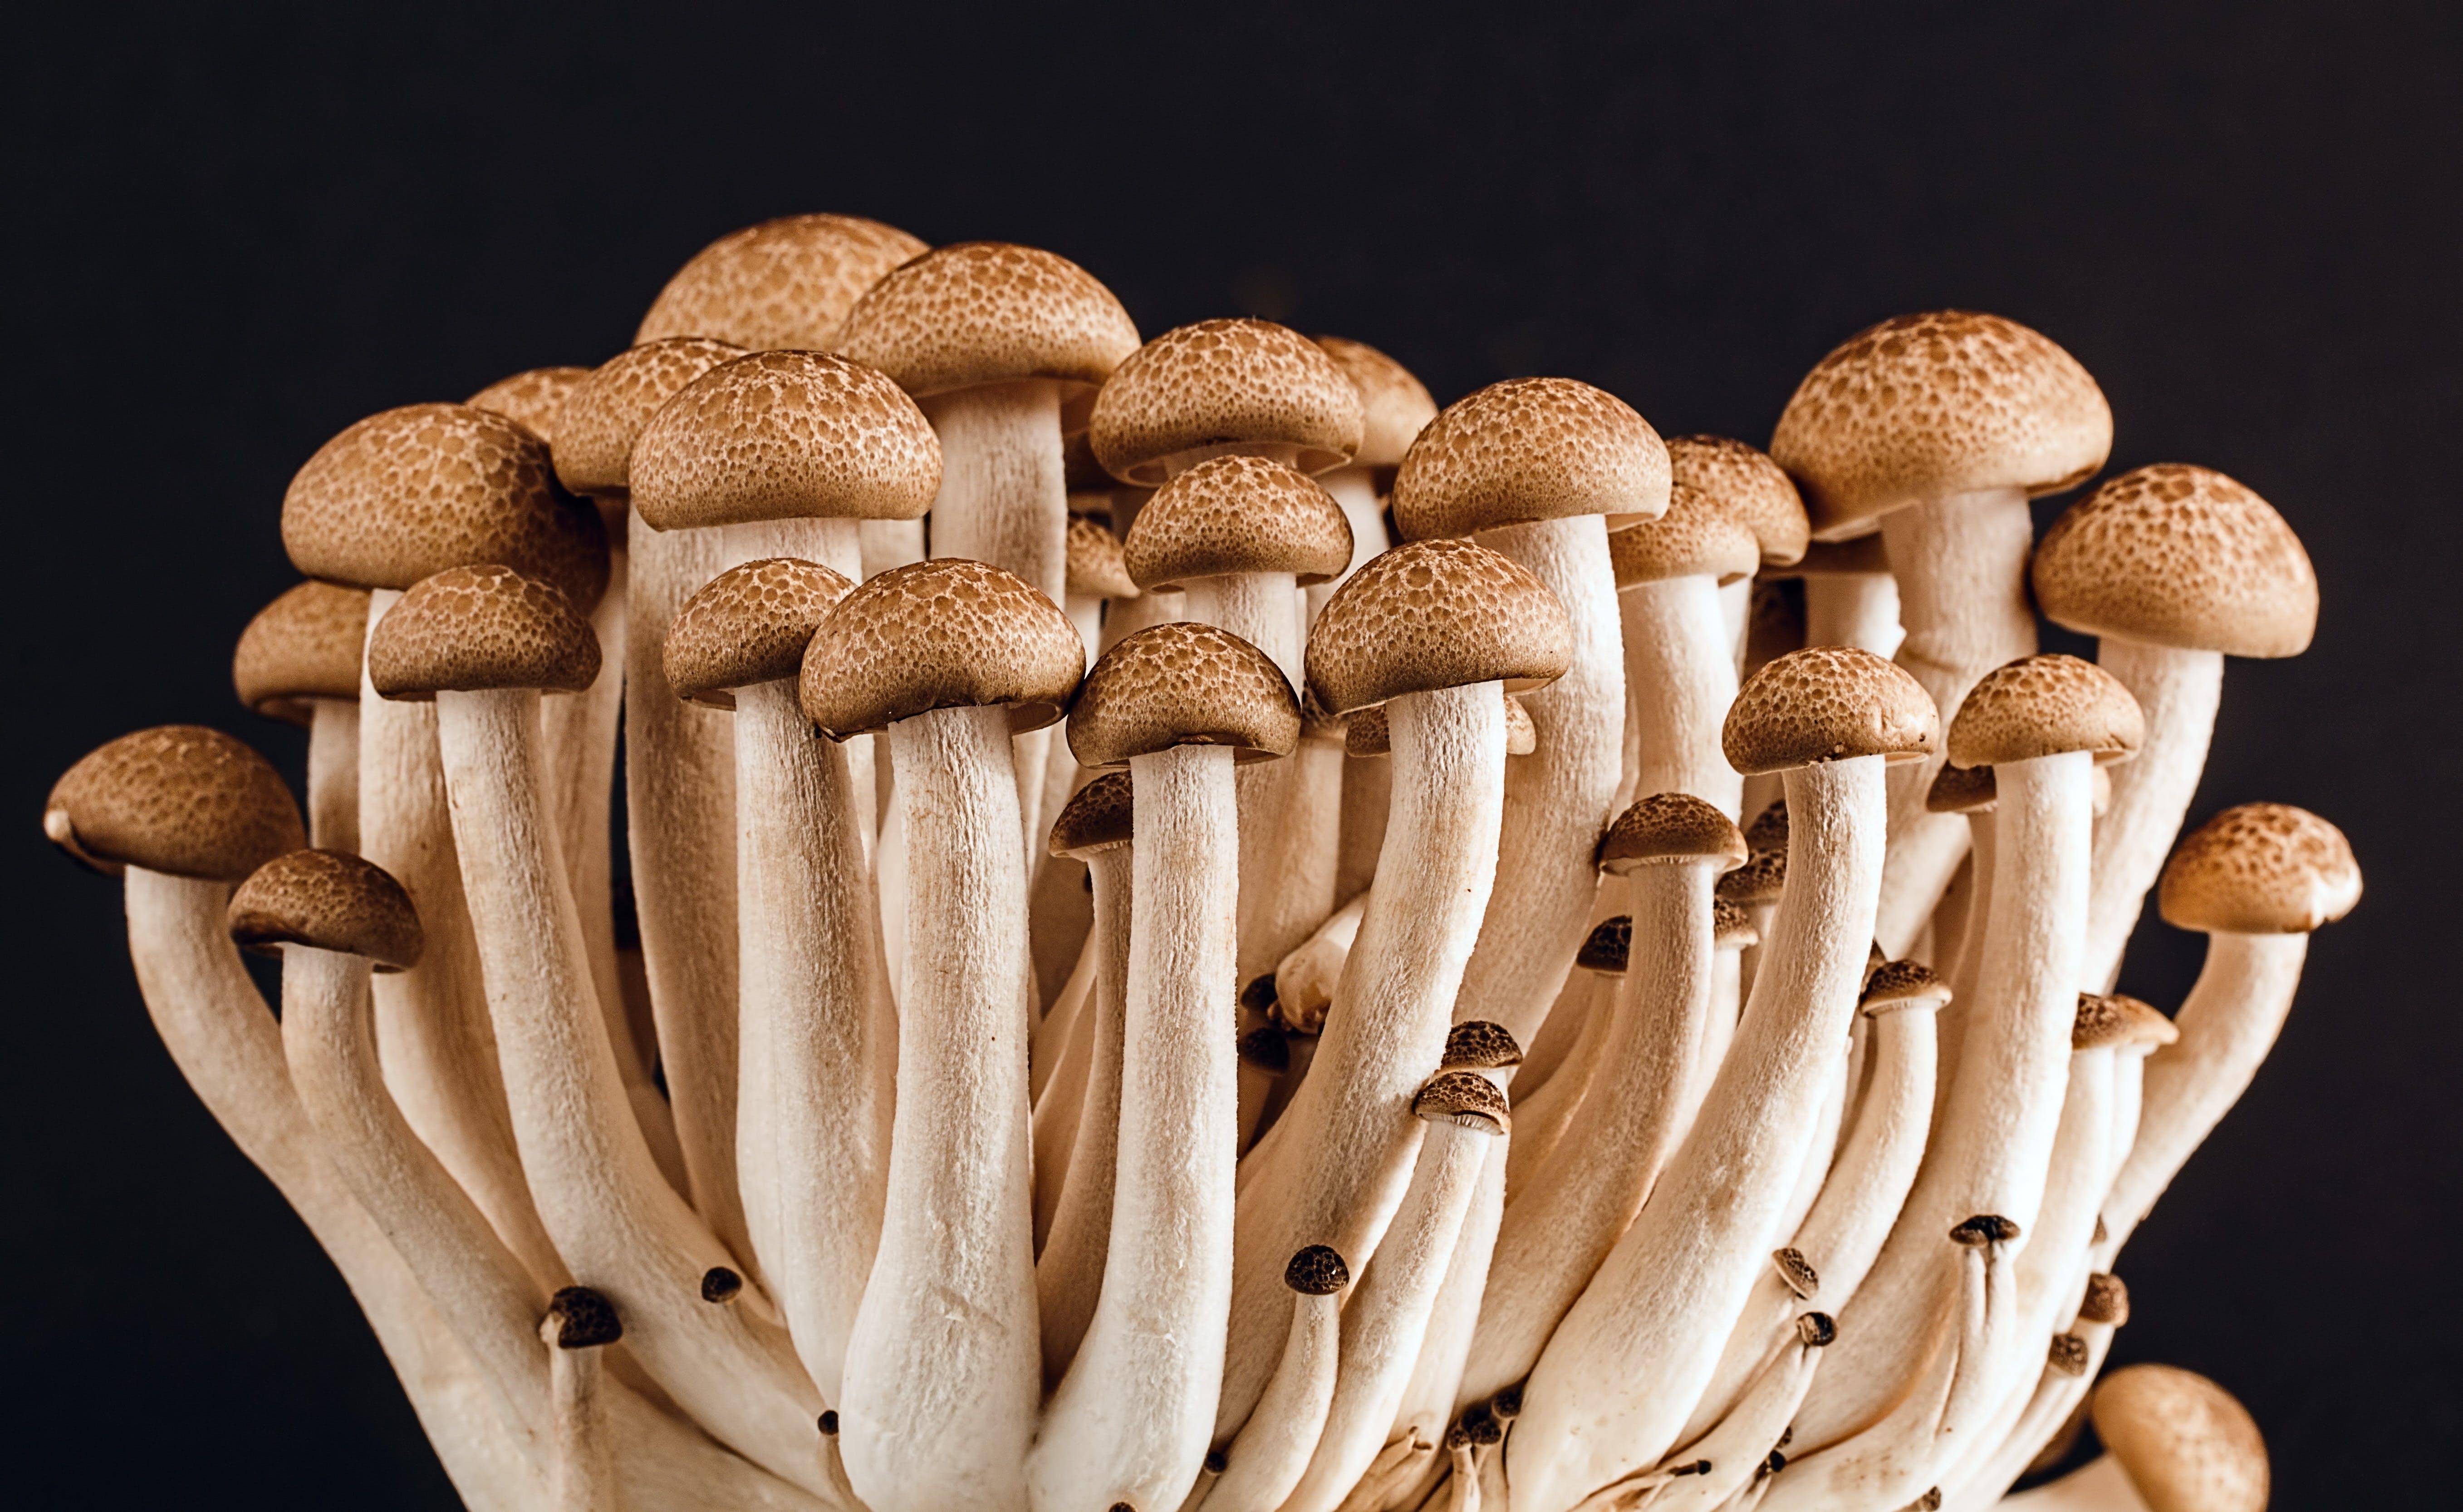 Foto stok gratis bisa dimakan, Cendawan, champignon, jamur